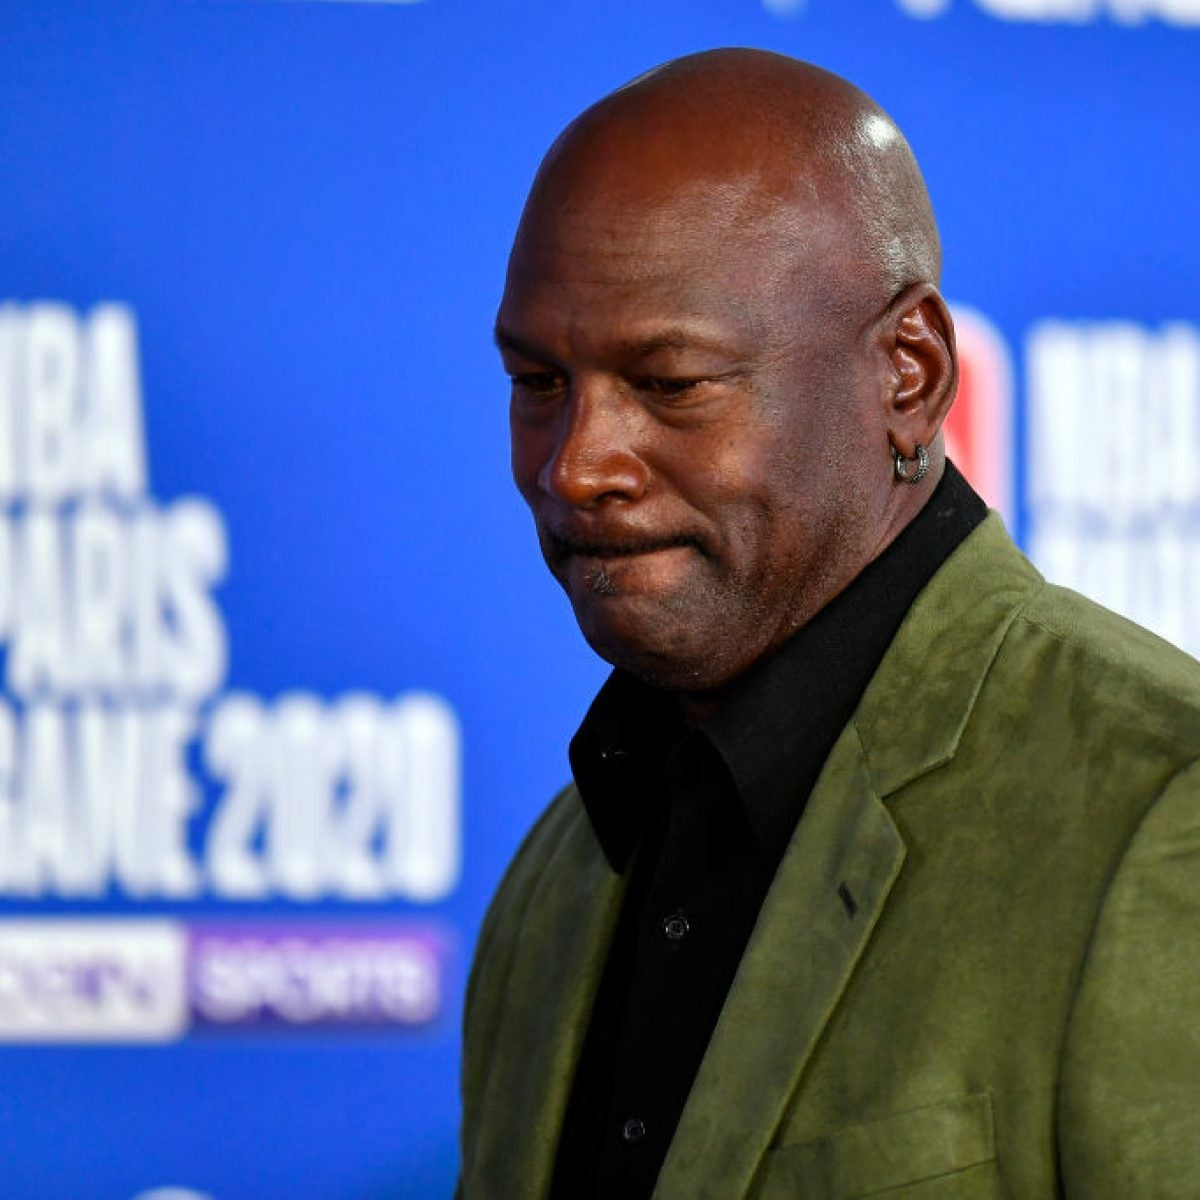 Michael Jordan Speaks Out On George Floyd's Murder In Rare Statement: 'We Have Had Enough'